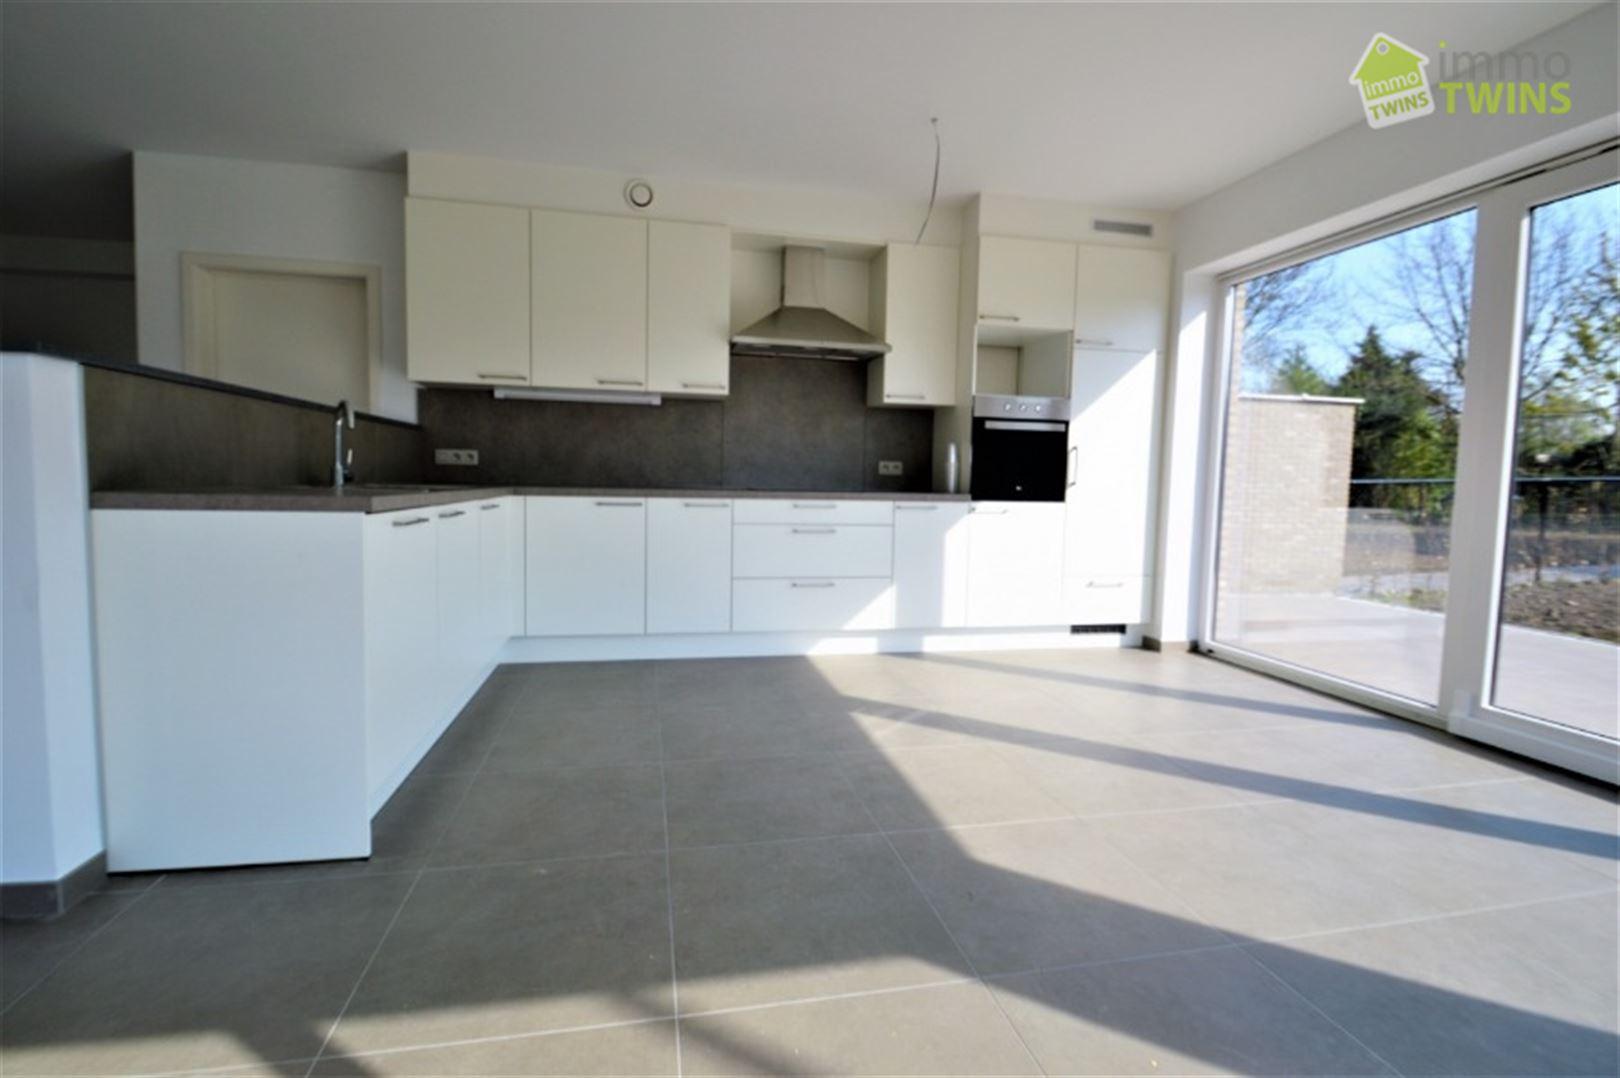 Foto 10 : Woning te 9200 Sint-Gillis-bij-Dendermonde (België) - Prijs € 999